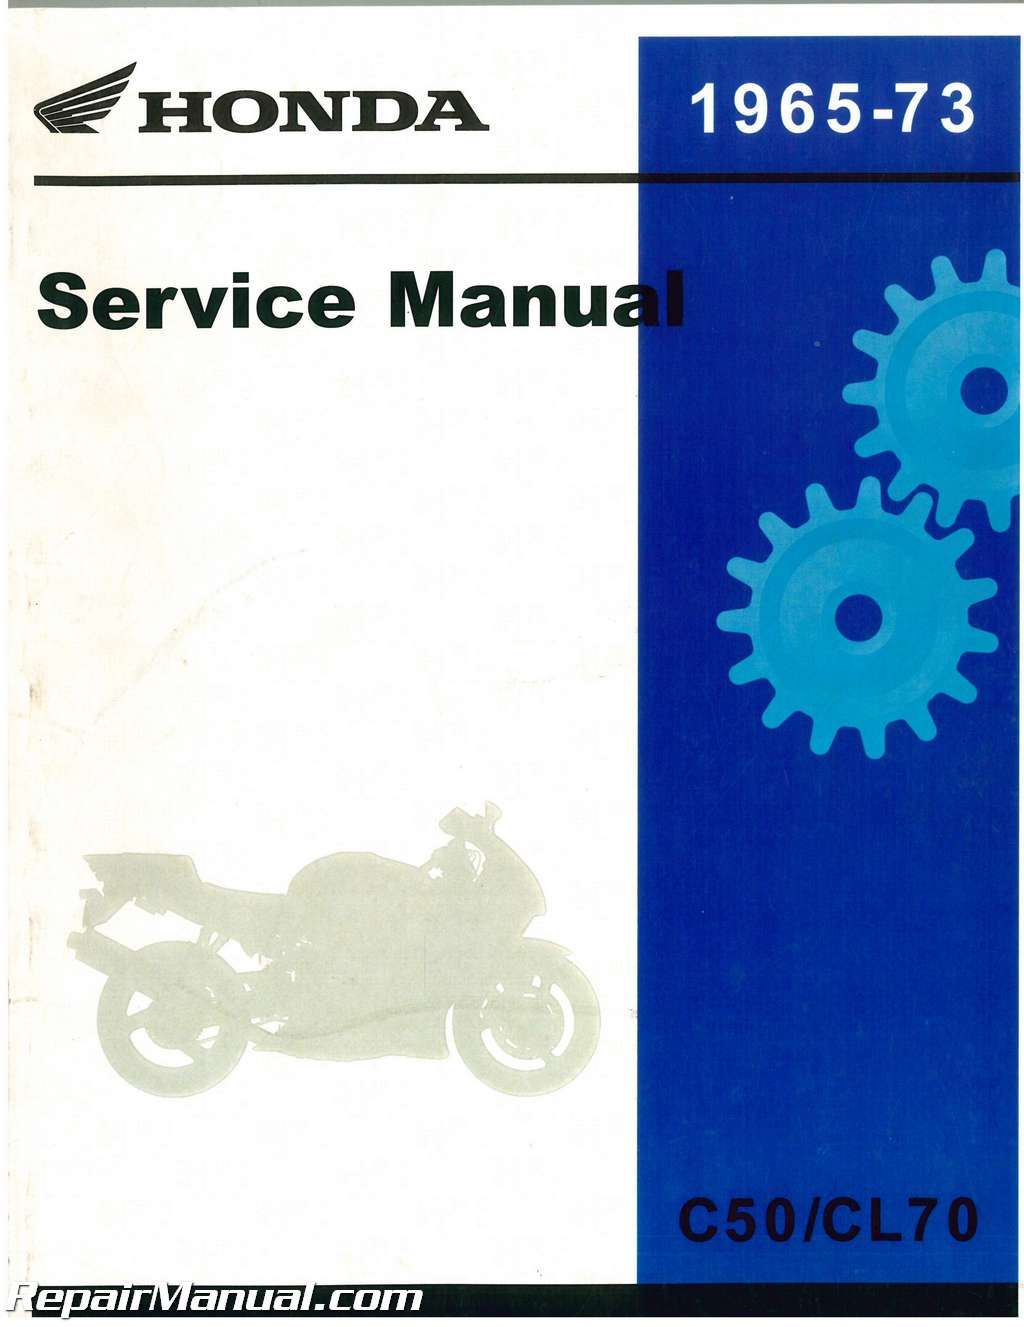 official 1965 1973 honda c50 c50m cl70 cd70 c65 c65m c70 s50 s65 rh repairmanual com honda c50 service manual greek Honda Z50